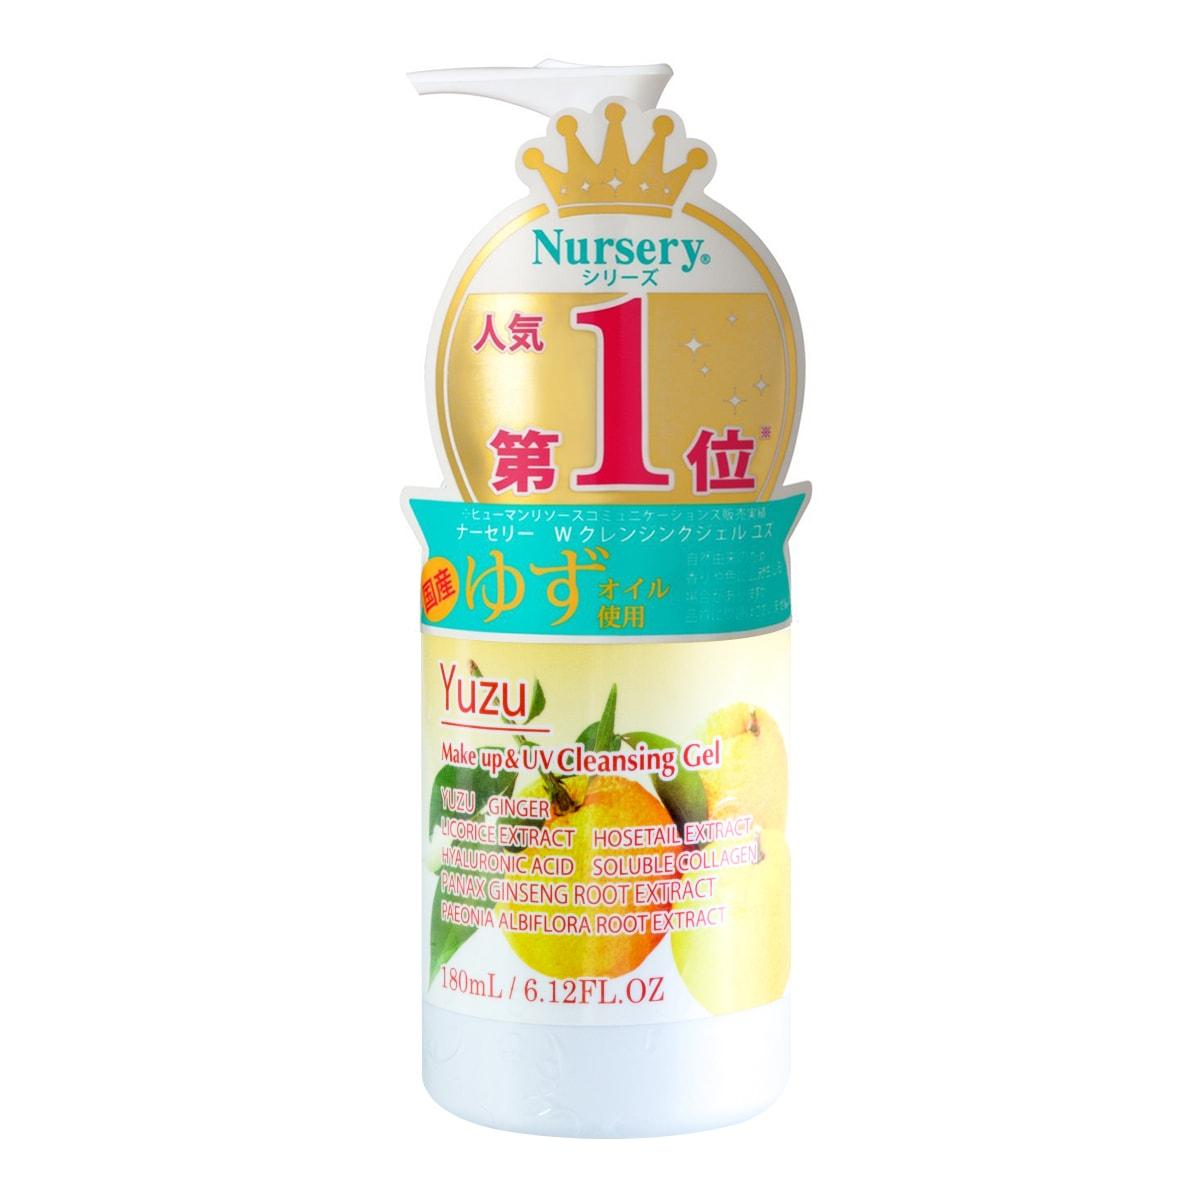 NURSERY Makeup & UV Cleansing Gel with Yuzu Extract 180ml